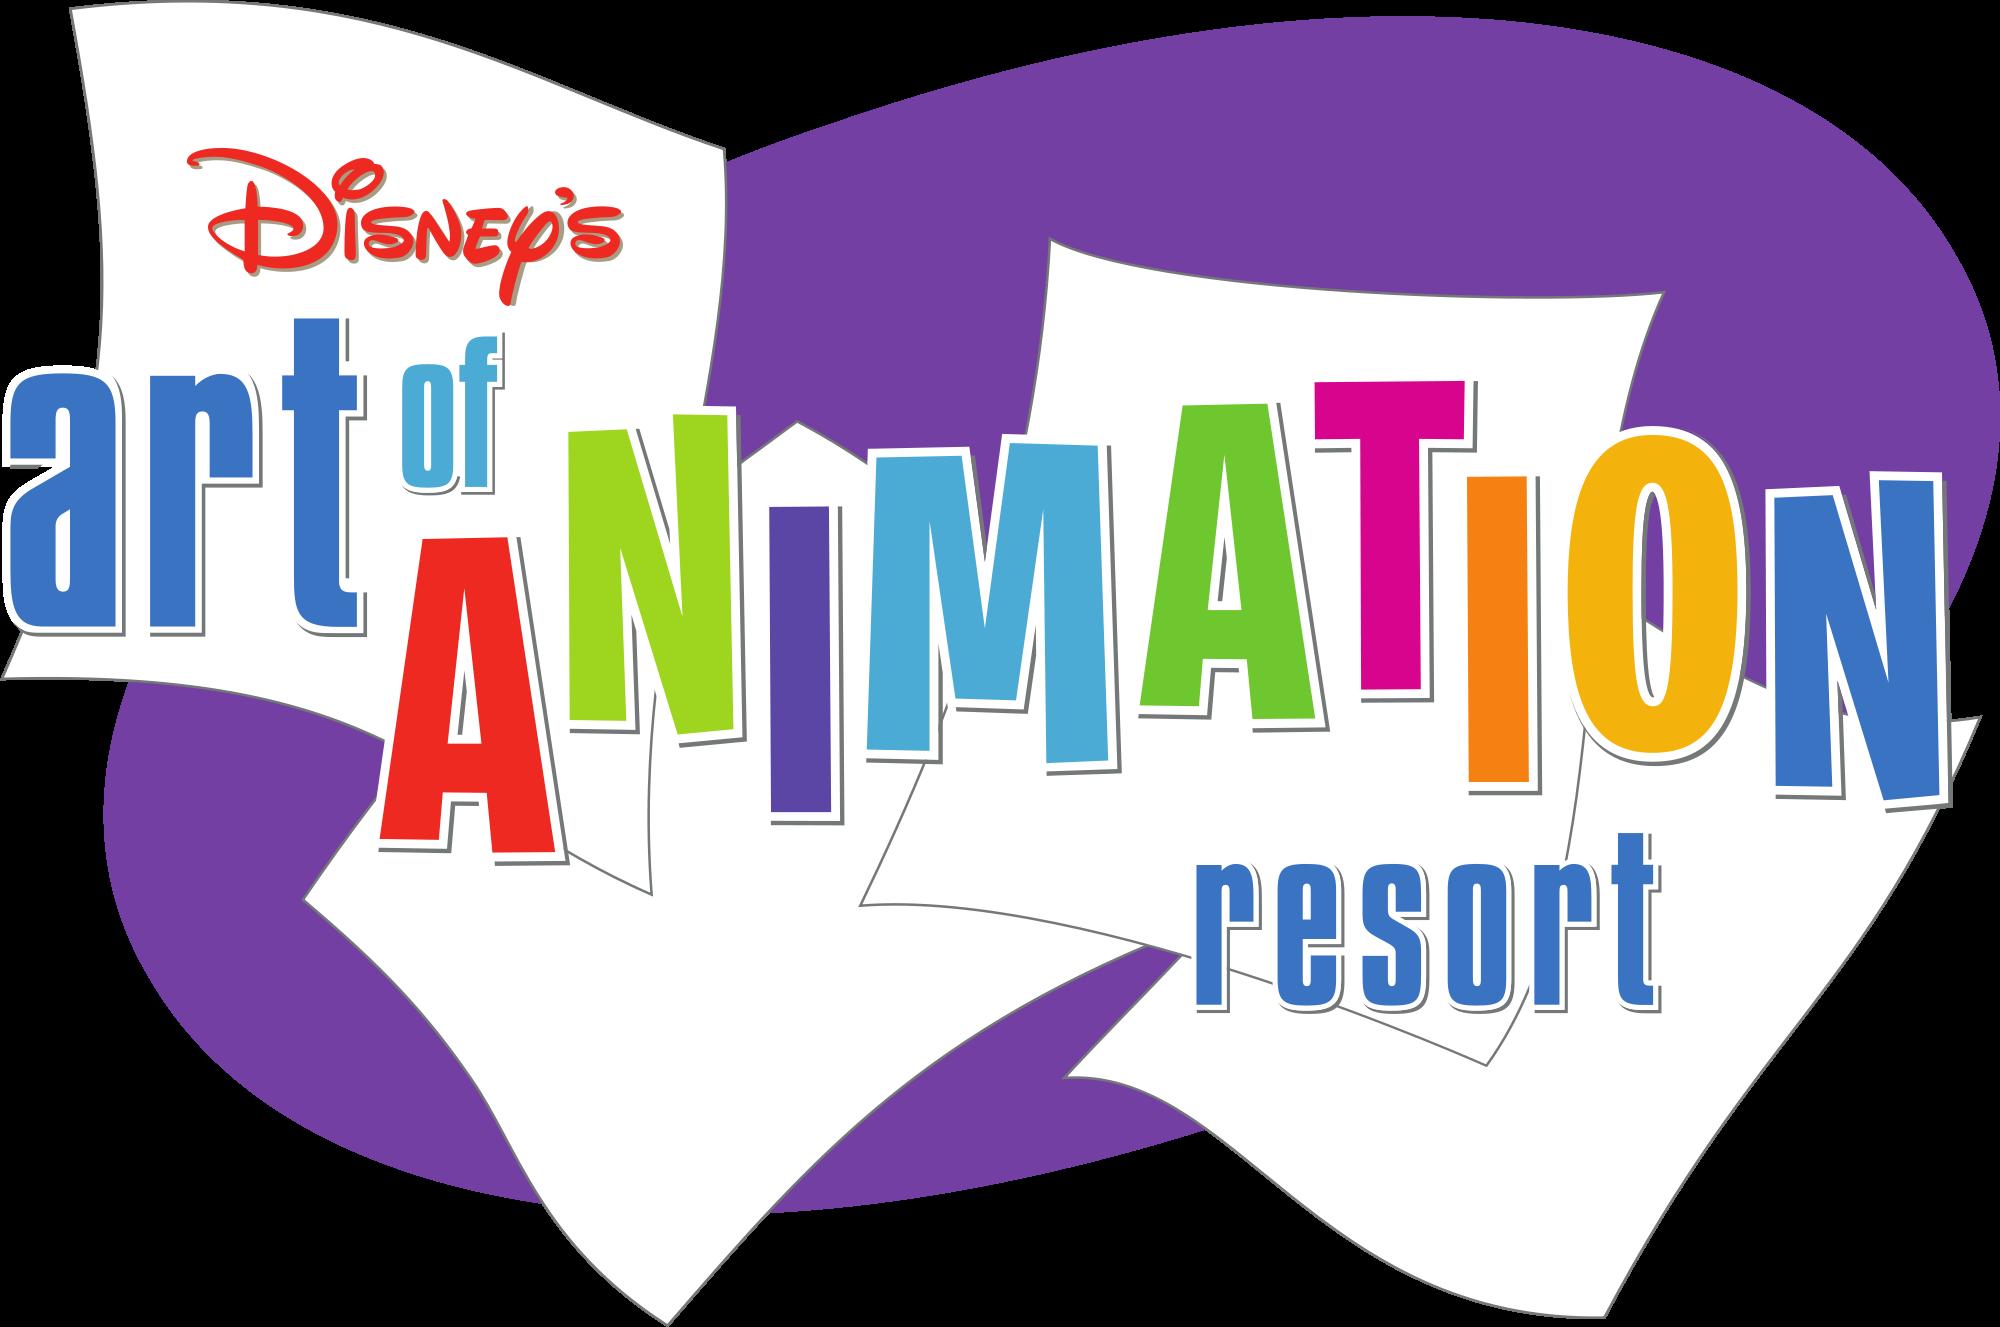 Disney s art of. Disneyland clipart map disneyland